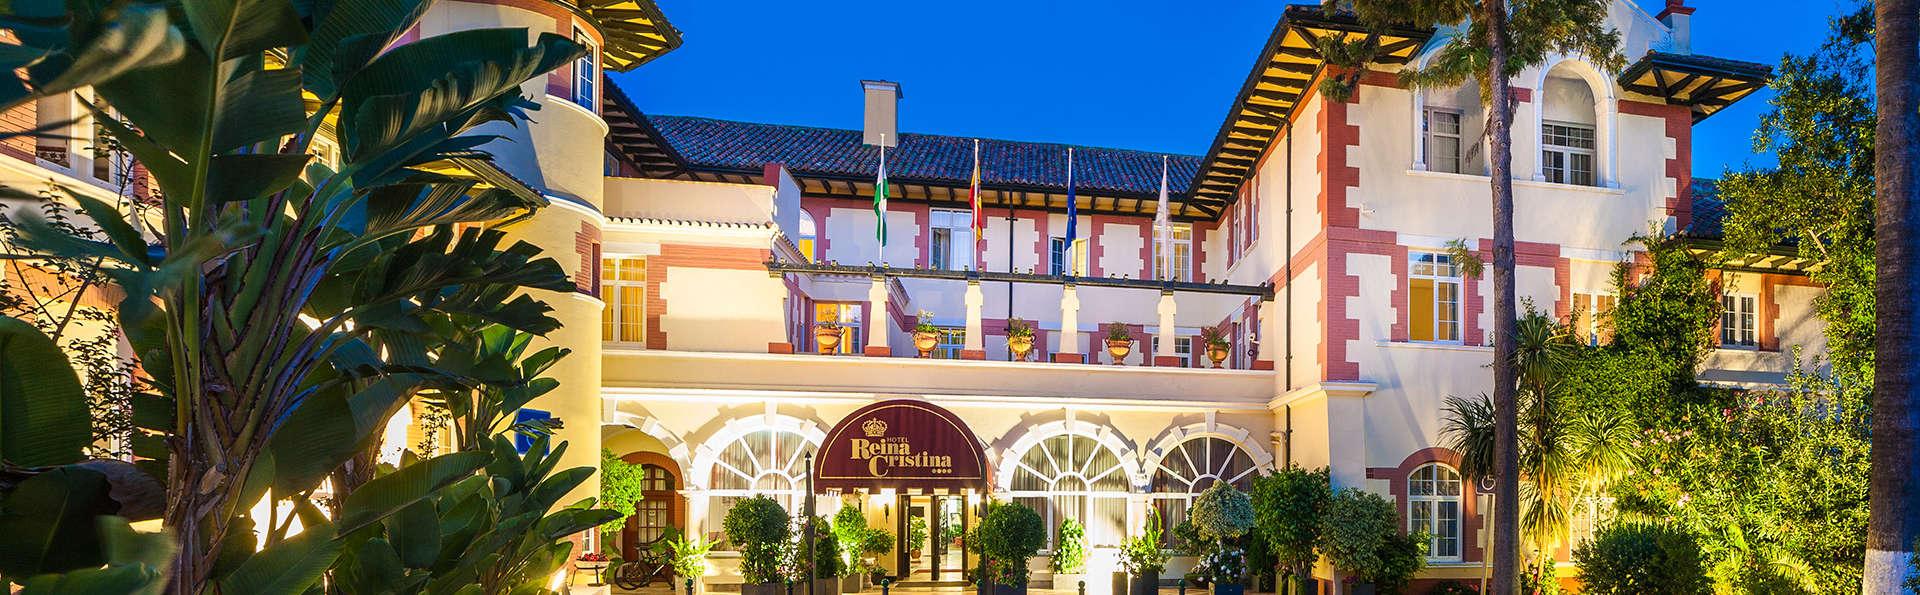 Hotel Globales Reina Cristina - edit_globales-reina-cristina-entrada-parking-nocturna.jpg